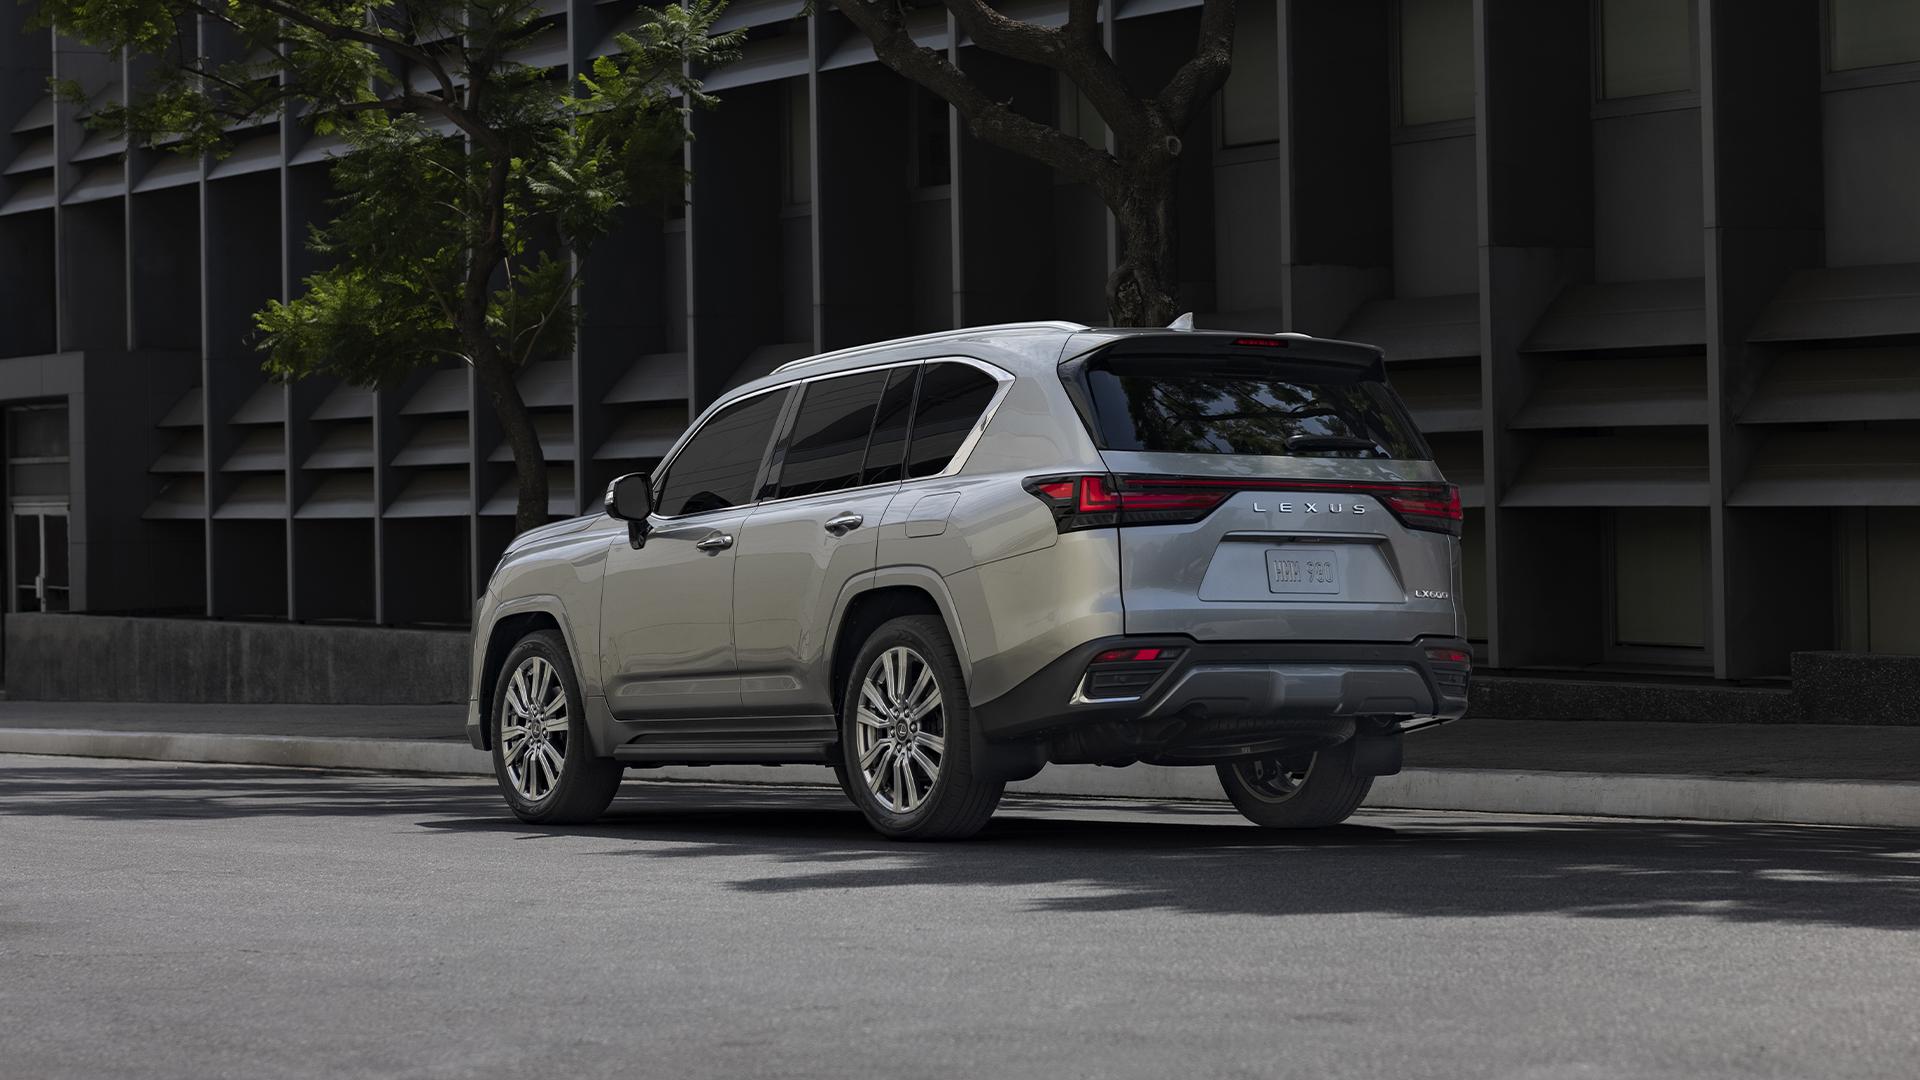 2022 Lexus LX 600 rear three-quarter action urban